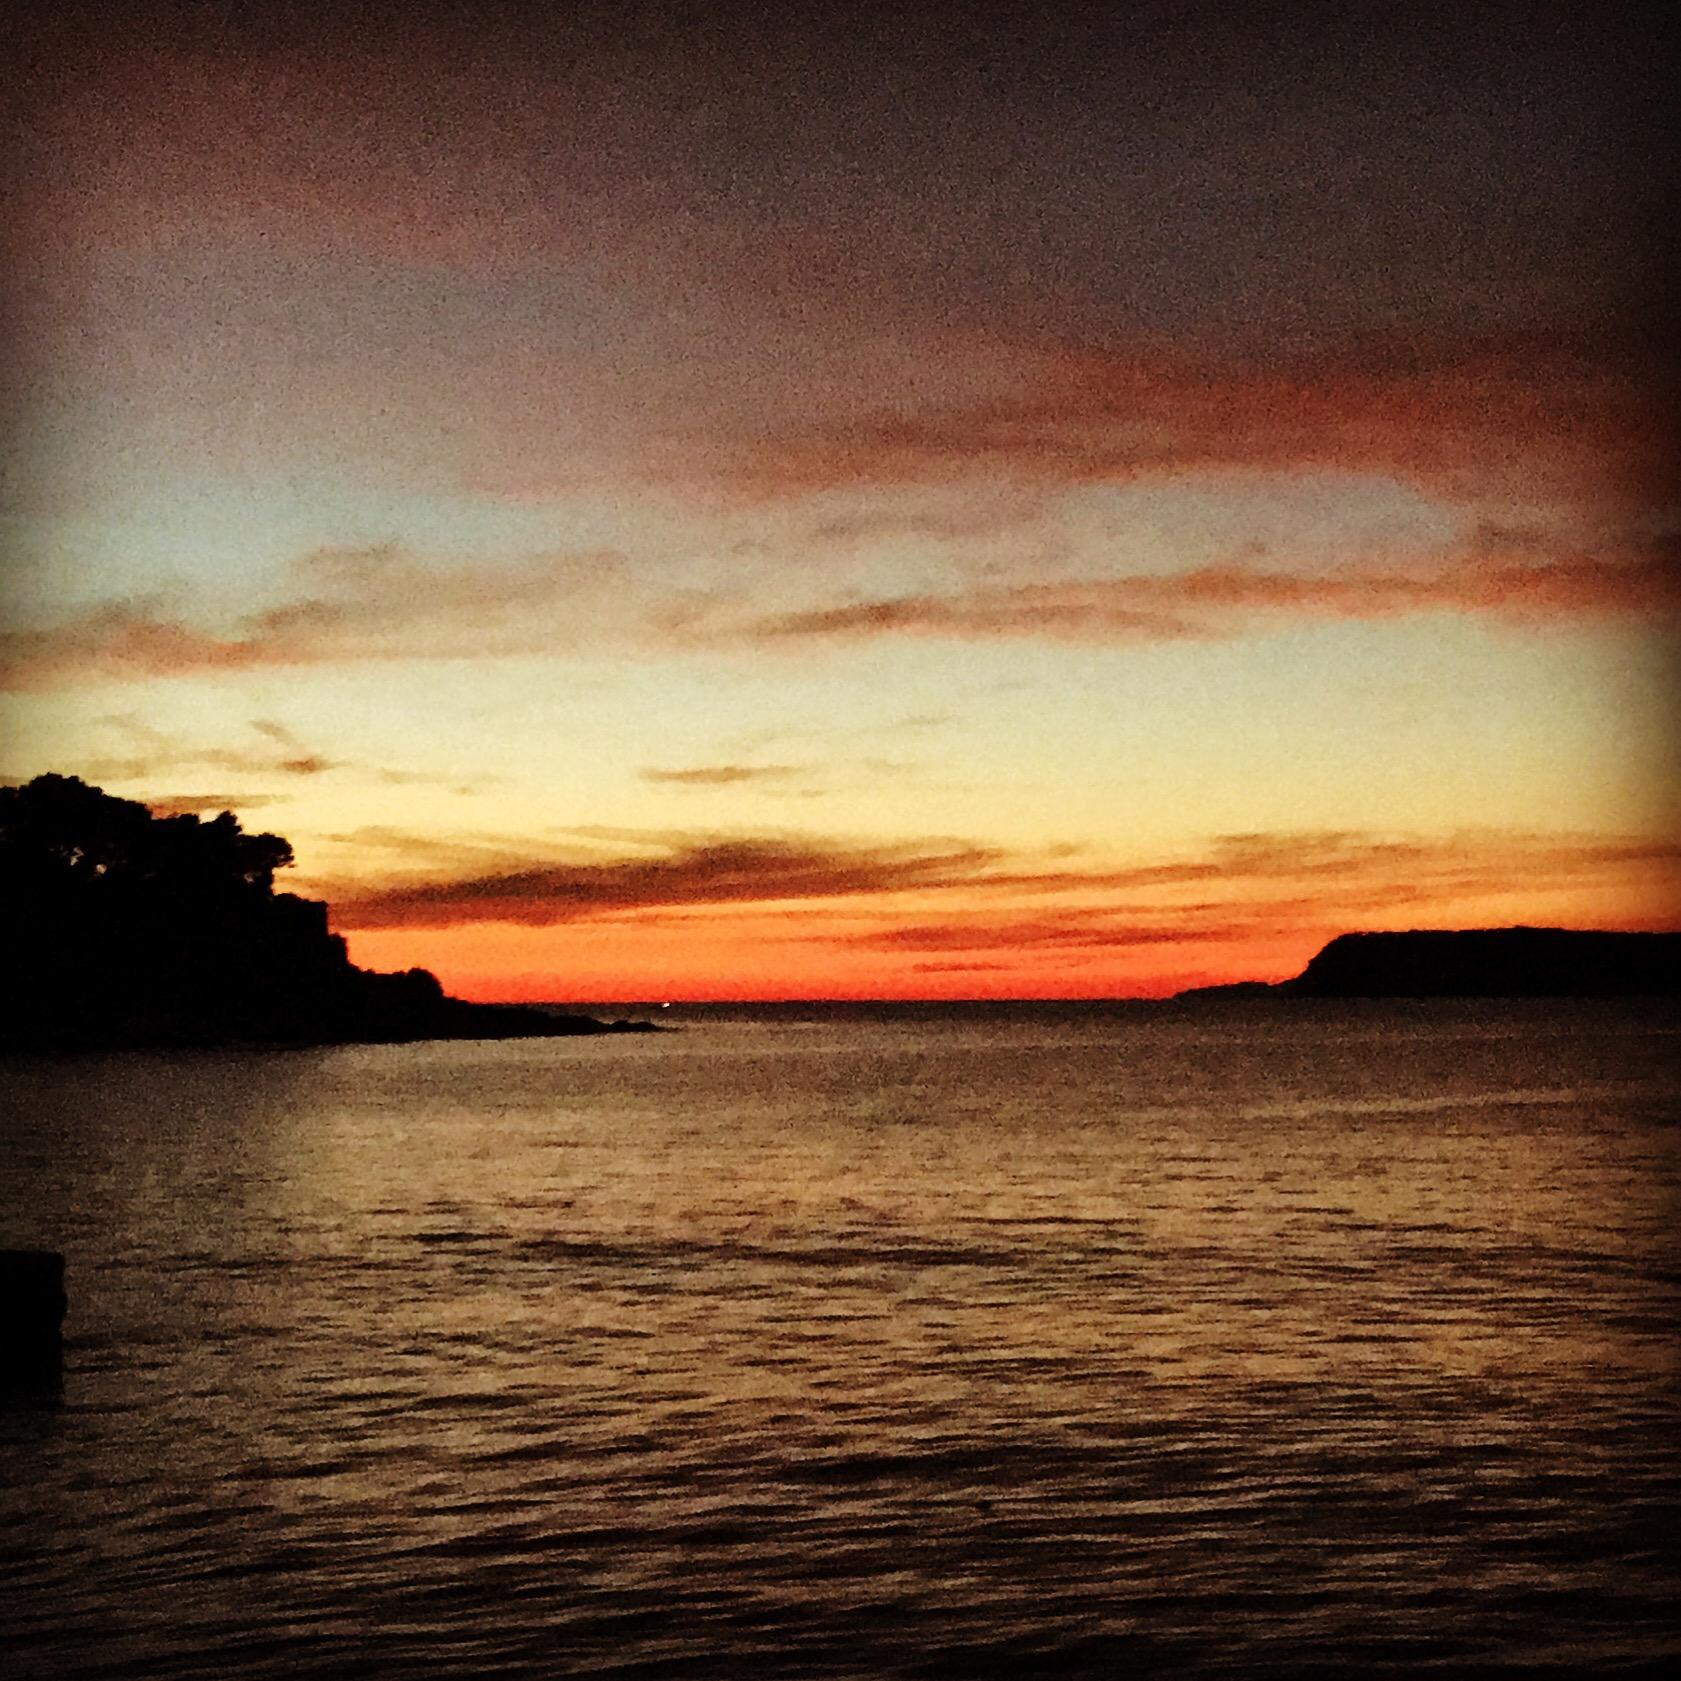 Sunset view from Lapad peninsula